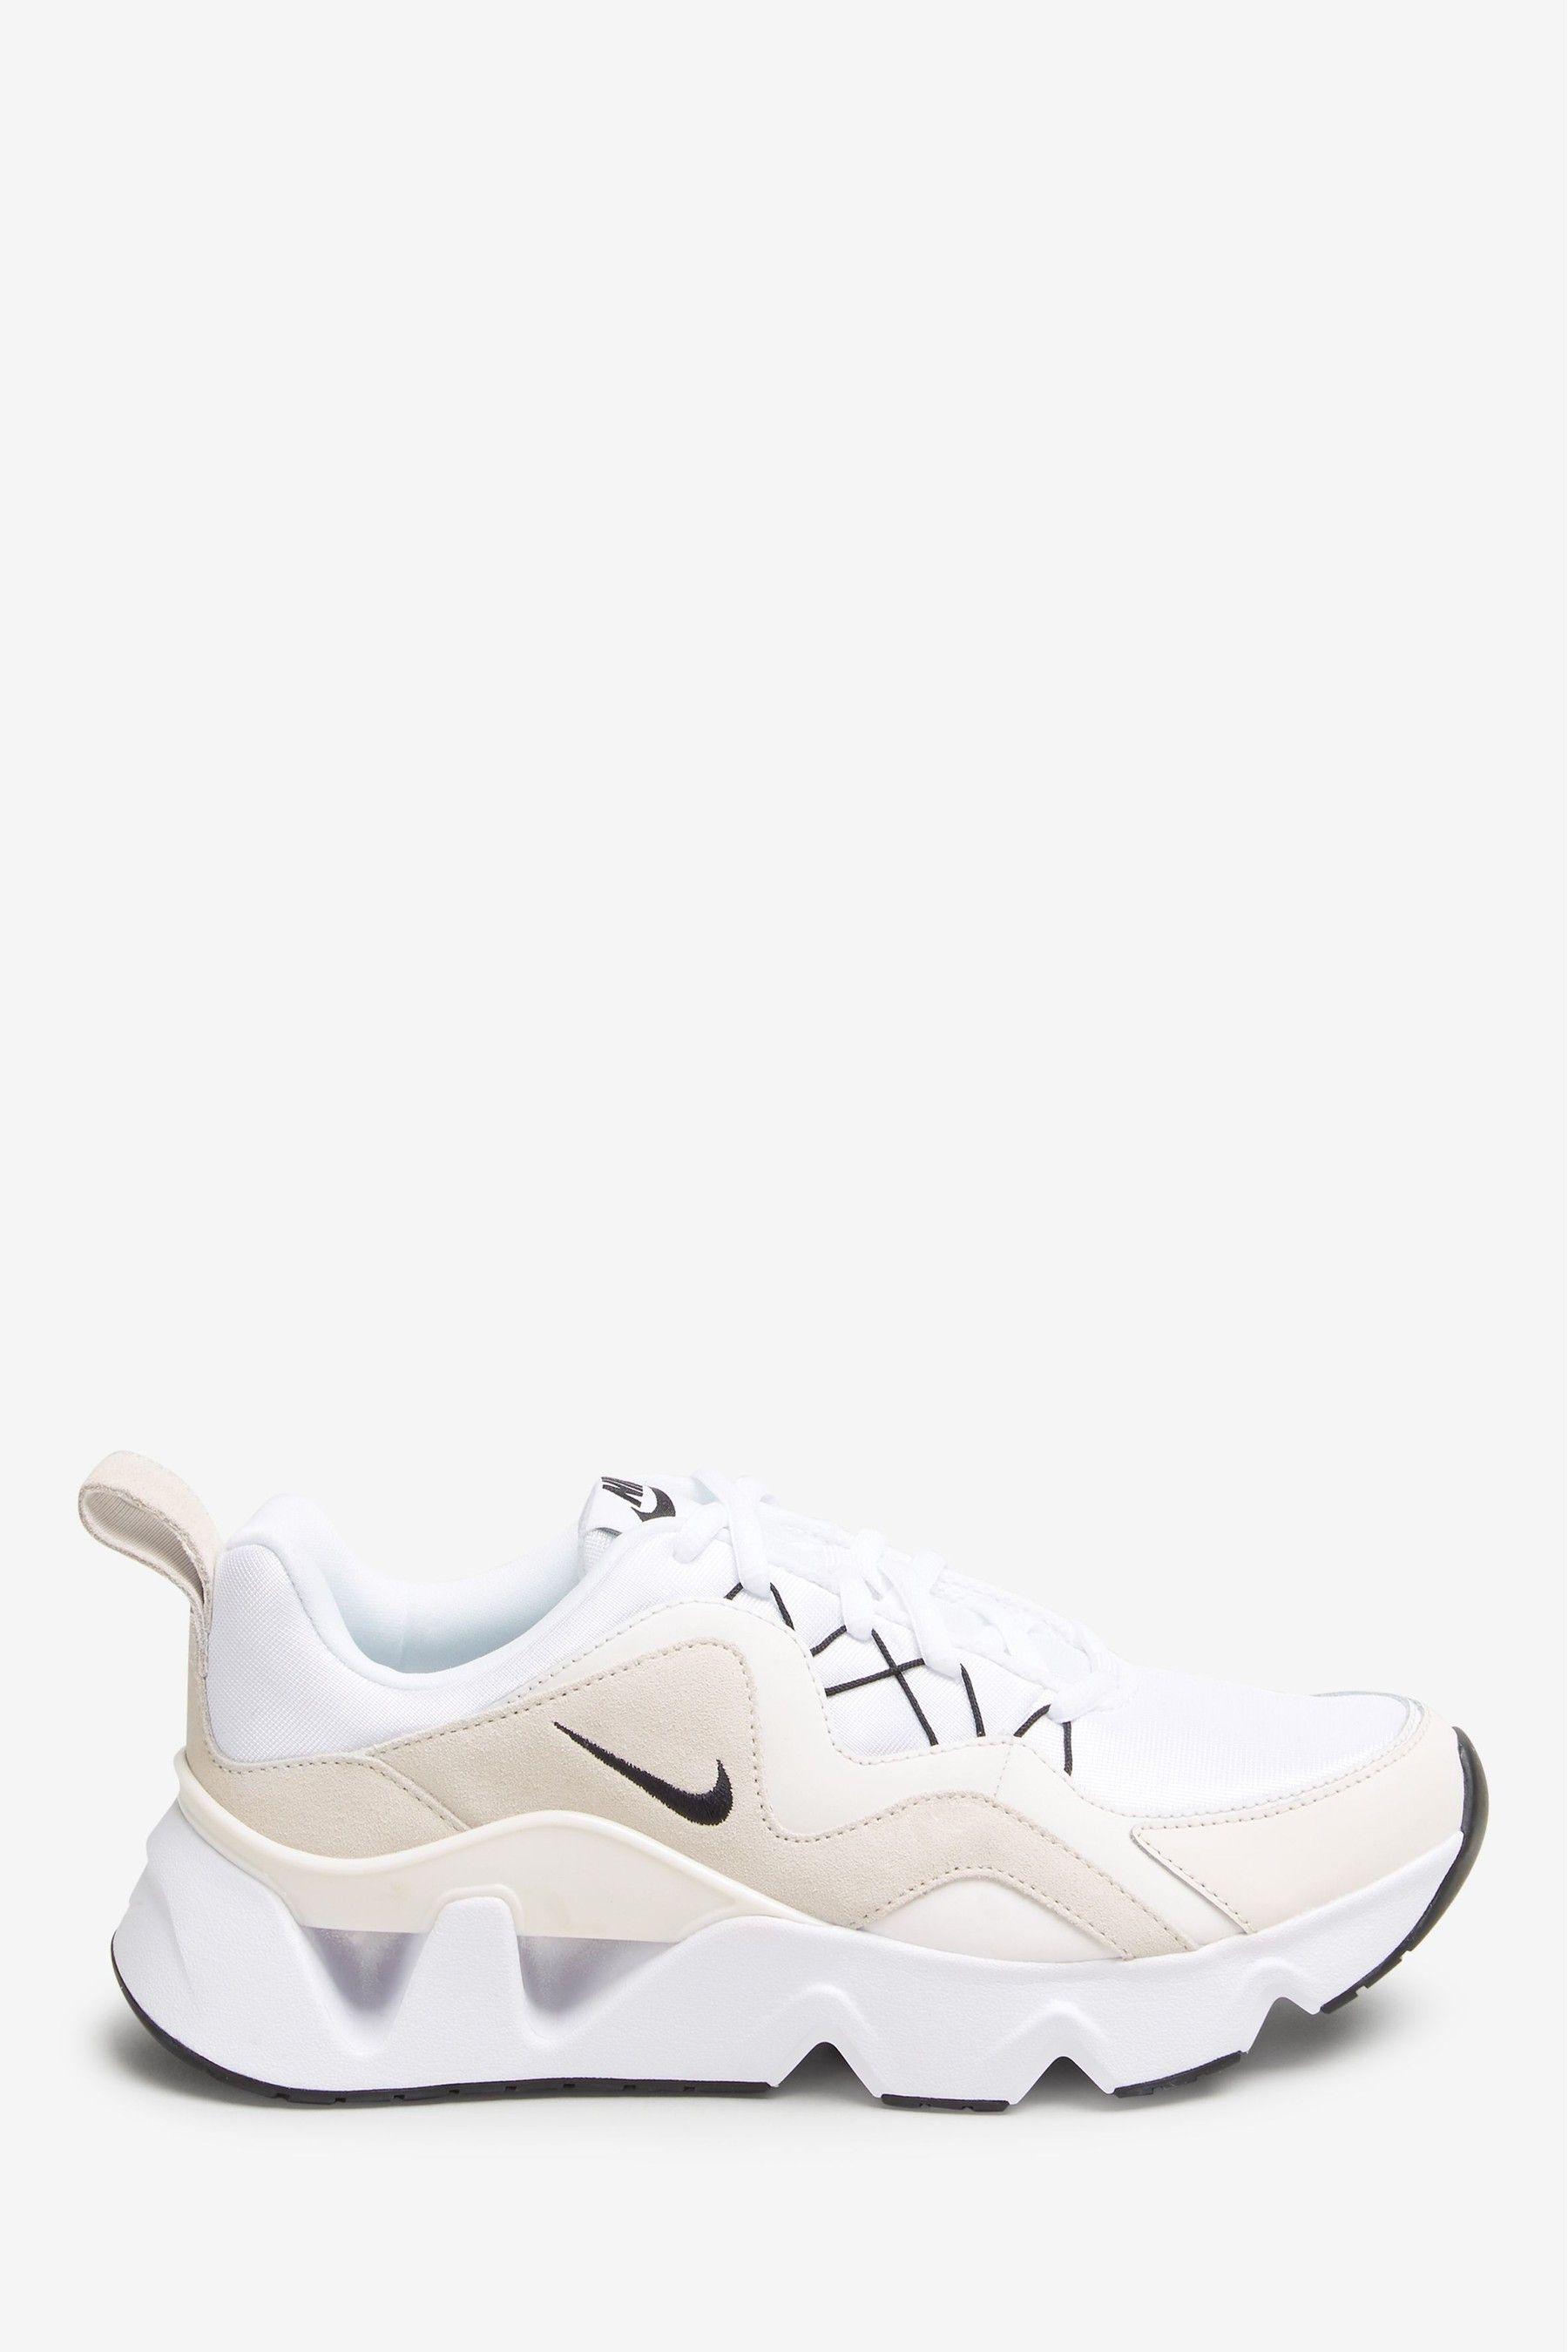 Womens Nike Ryz 365 Trainers White | Nike, Nike women